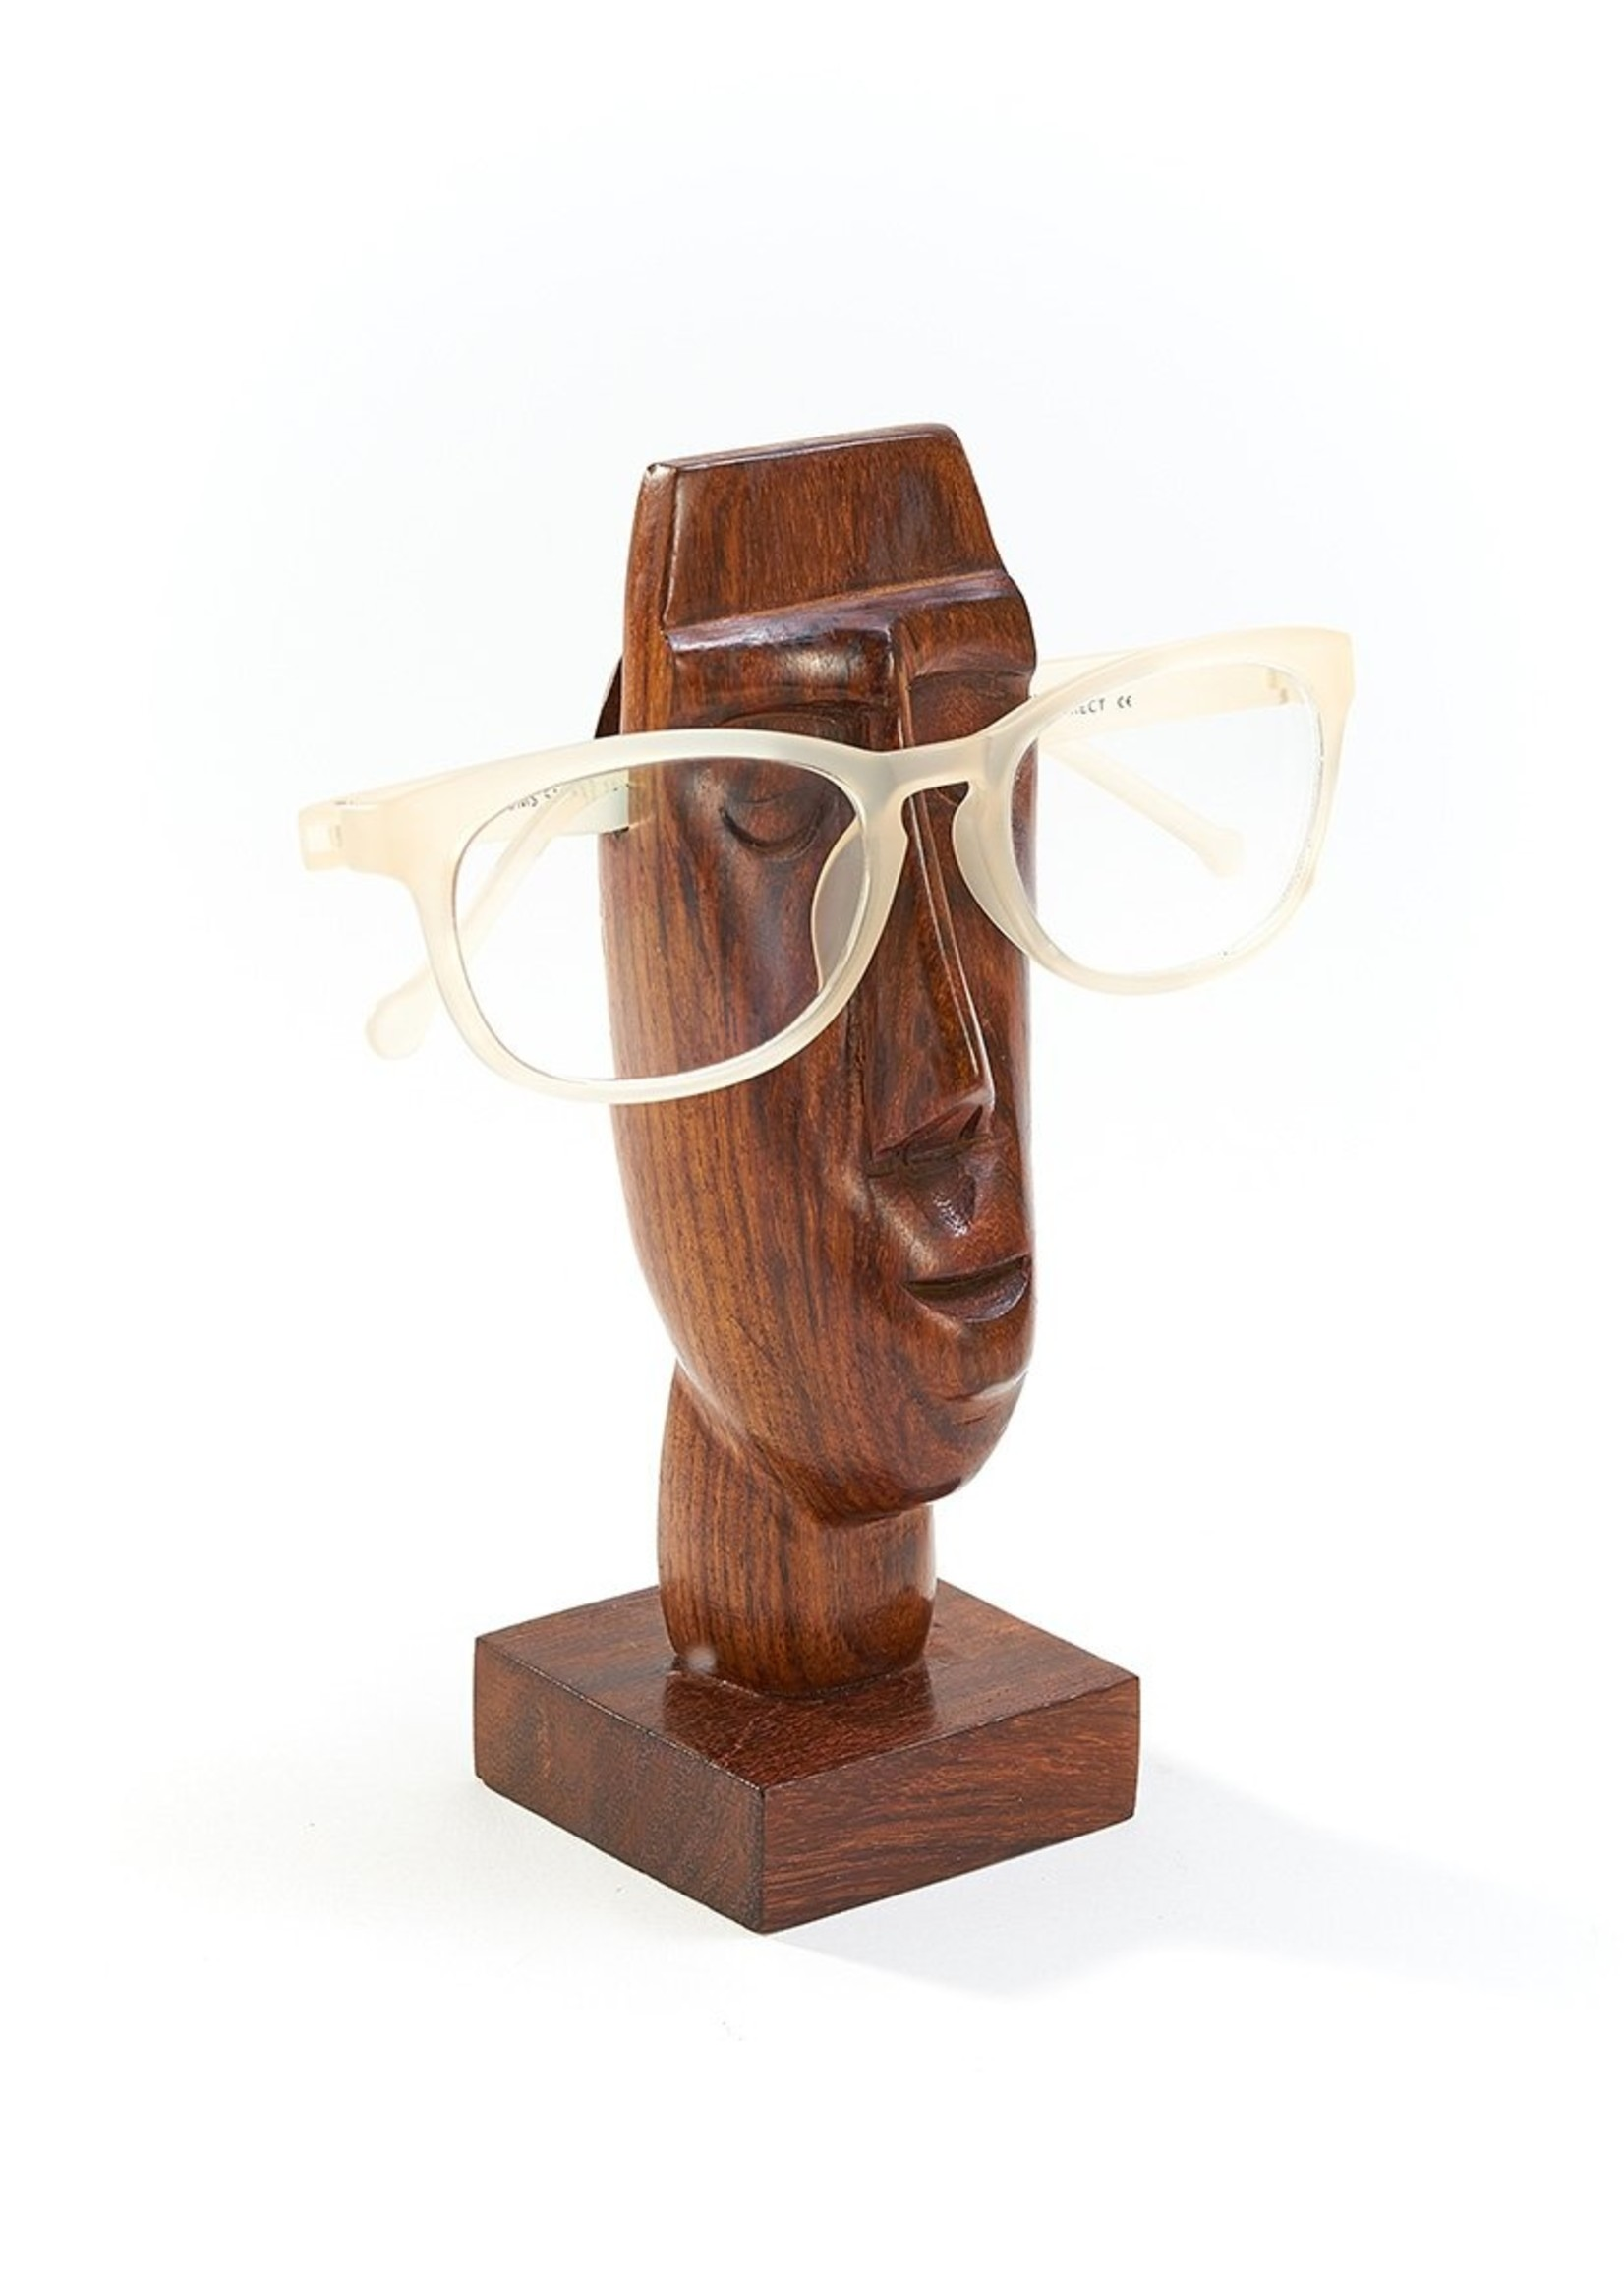 Matr Boomie Rapa Nui Eyeglass Holder